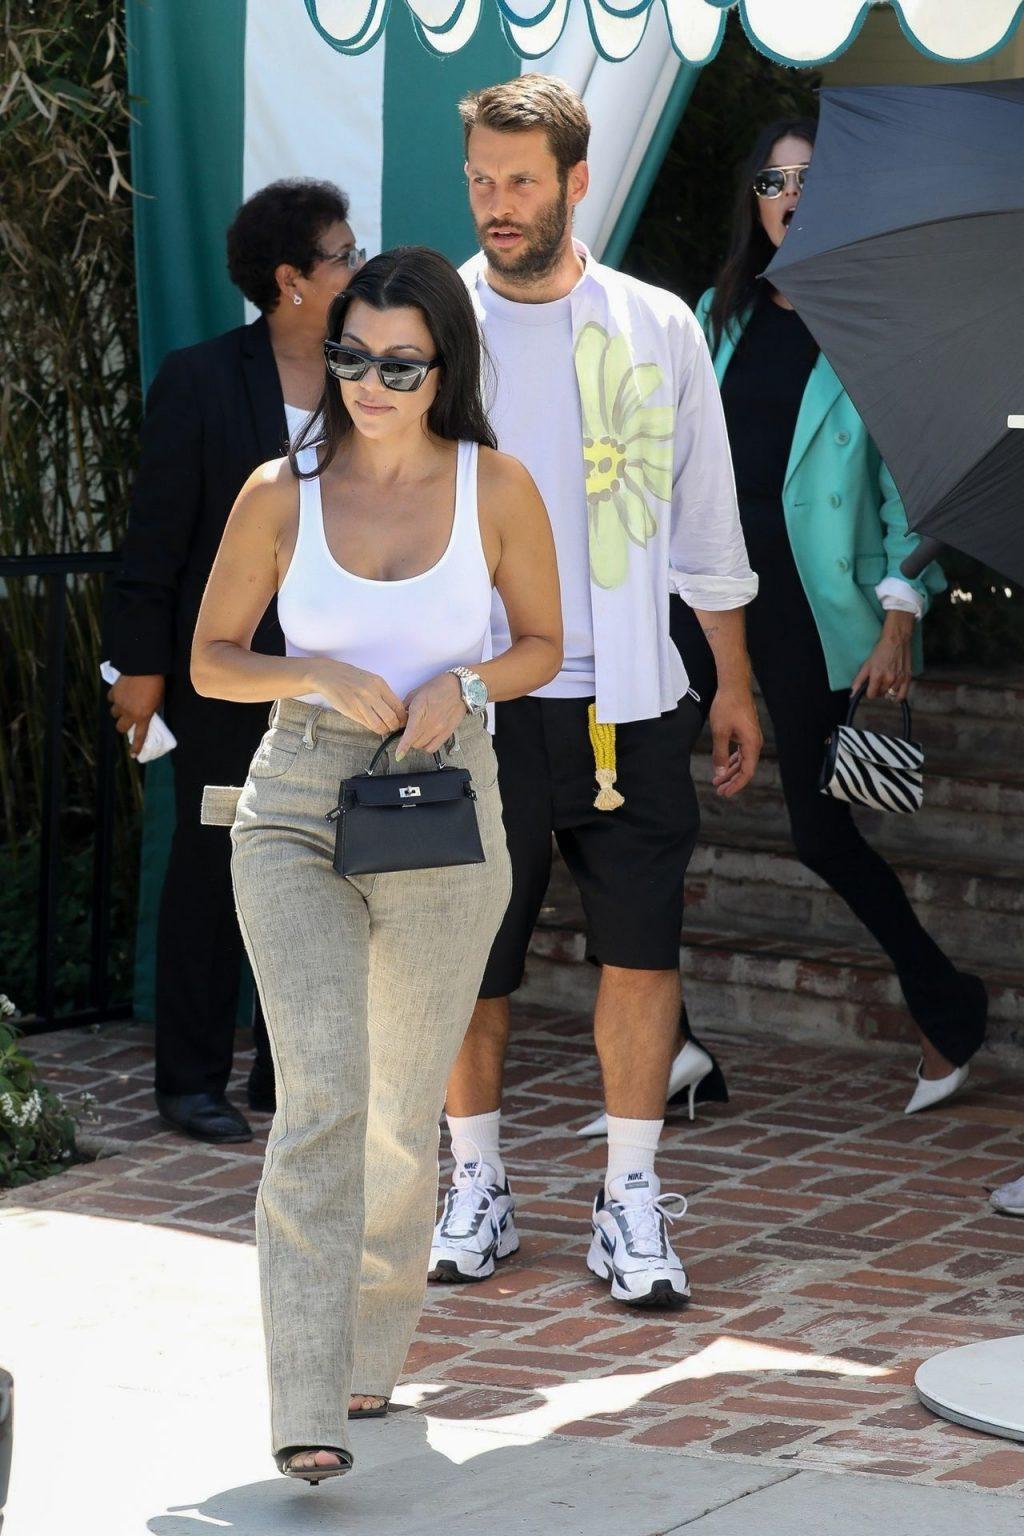 Kourtney Kardashian See Through Thefappeningblog Com 48 1024